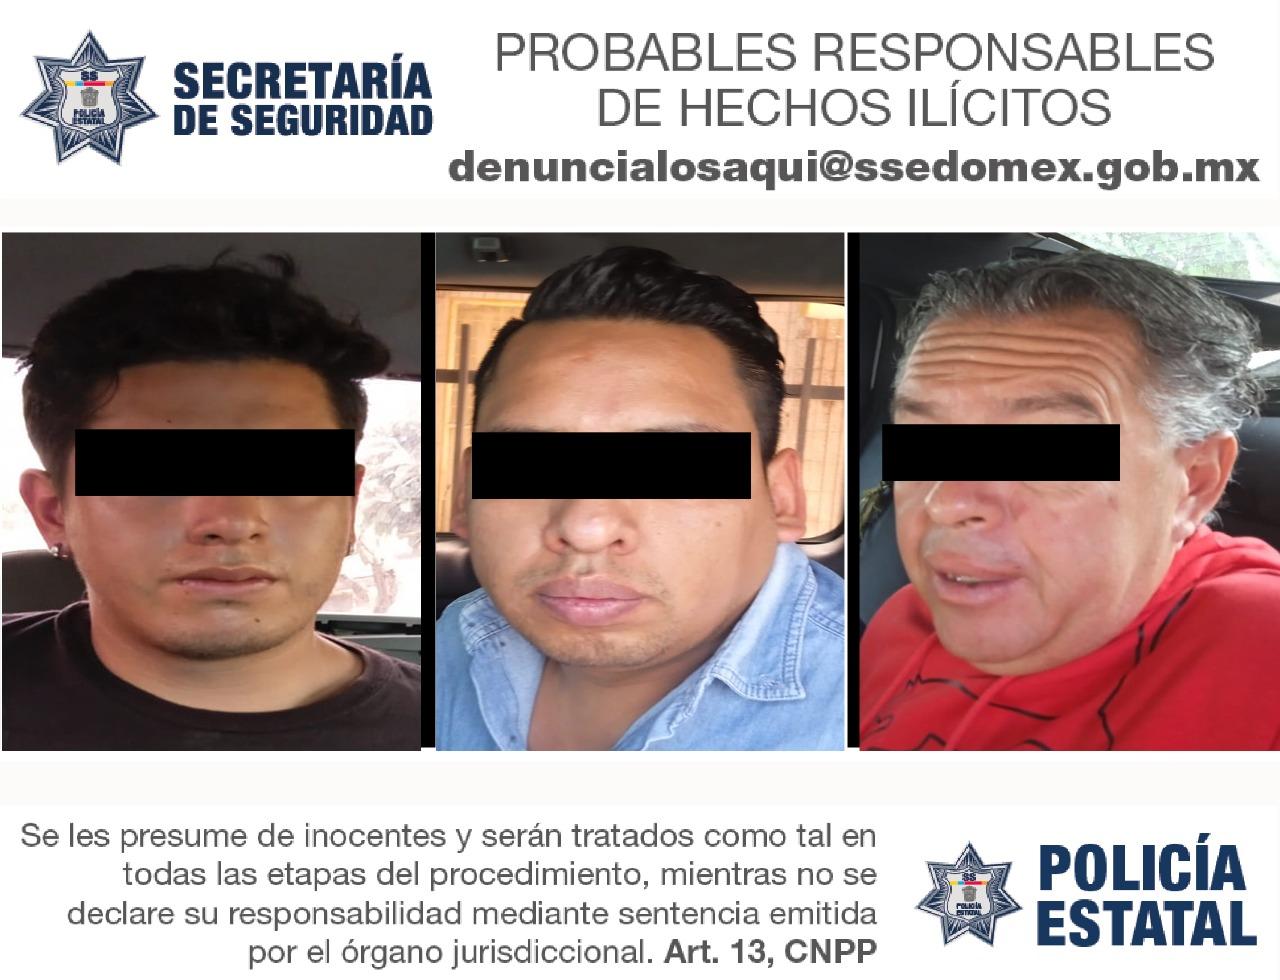 RECUPERAN EN NAUCALPAN CUATRO VEHÍCULOS CON REPORTE DE ROBO